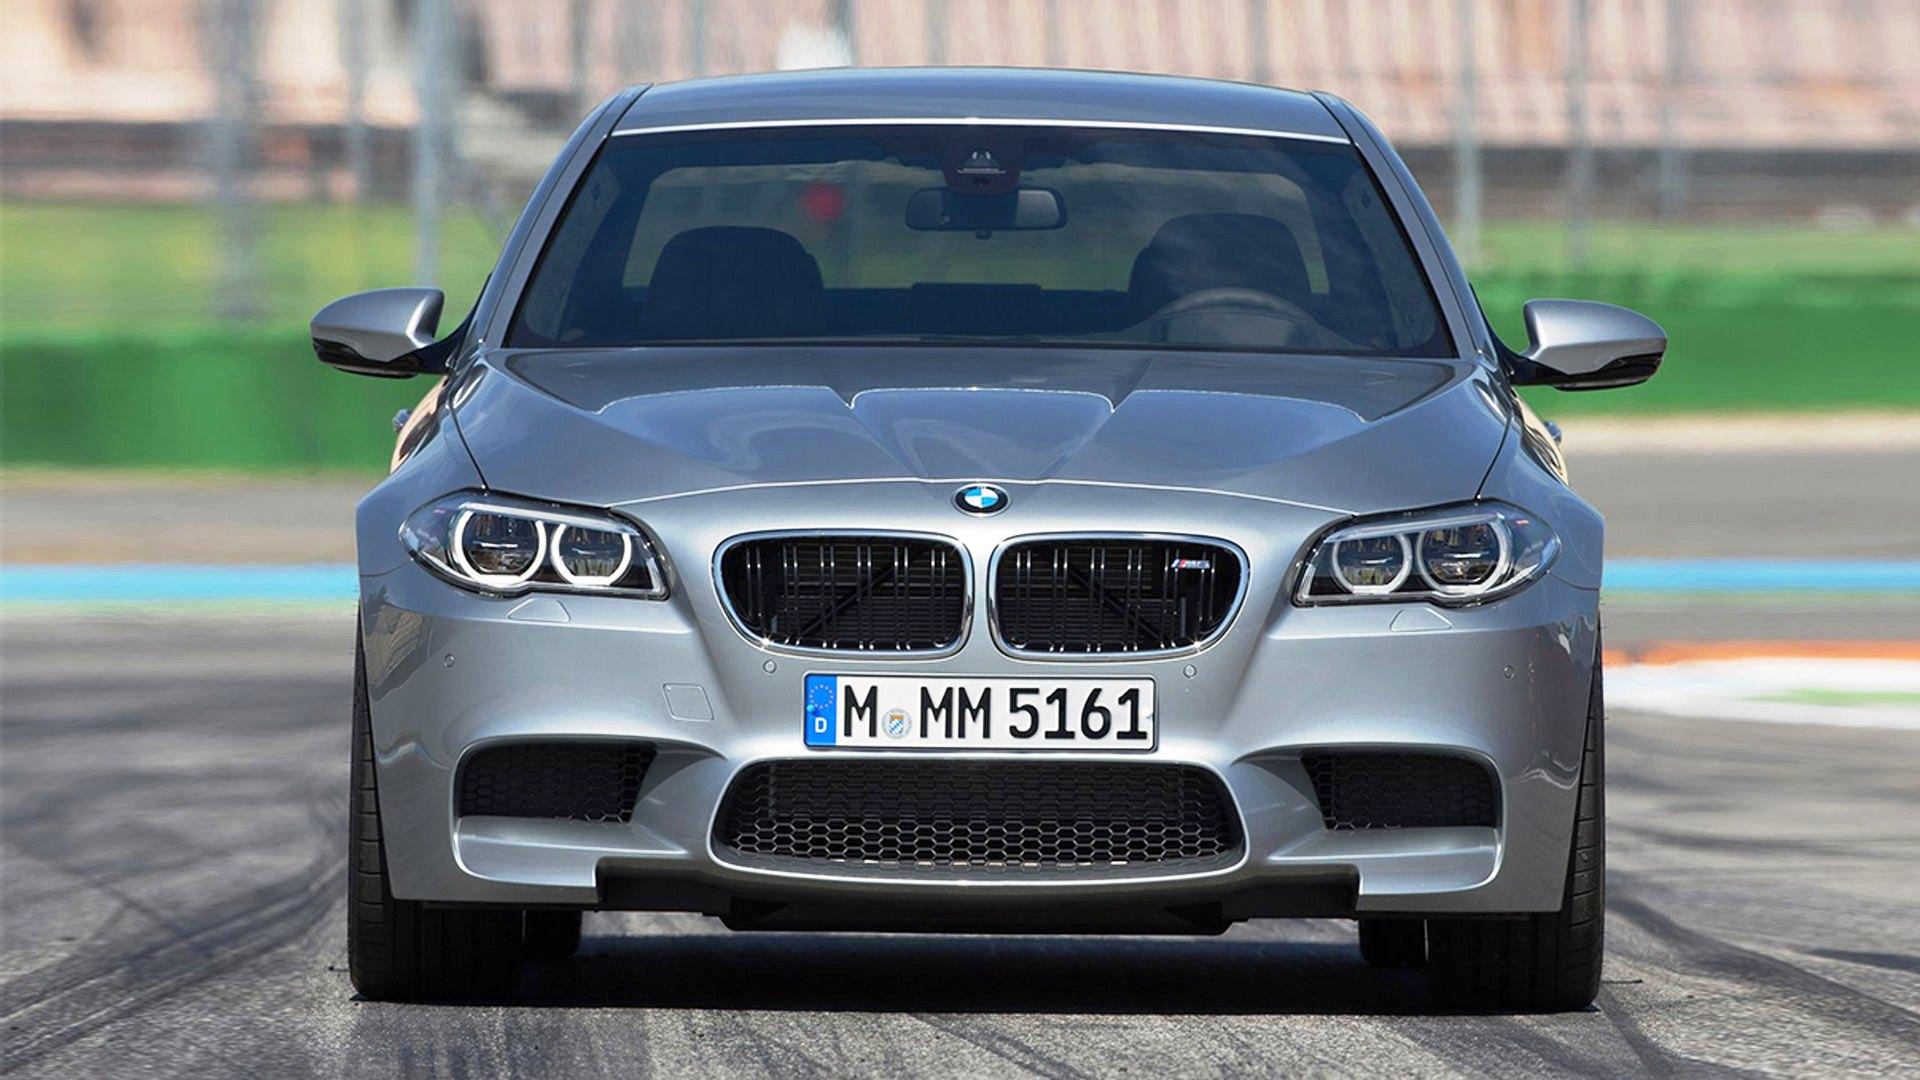 2014 BMW M5 Full Desktop Backgrounds 1920x1080